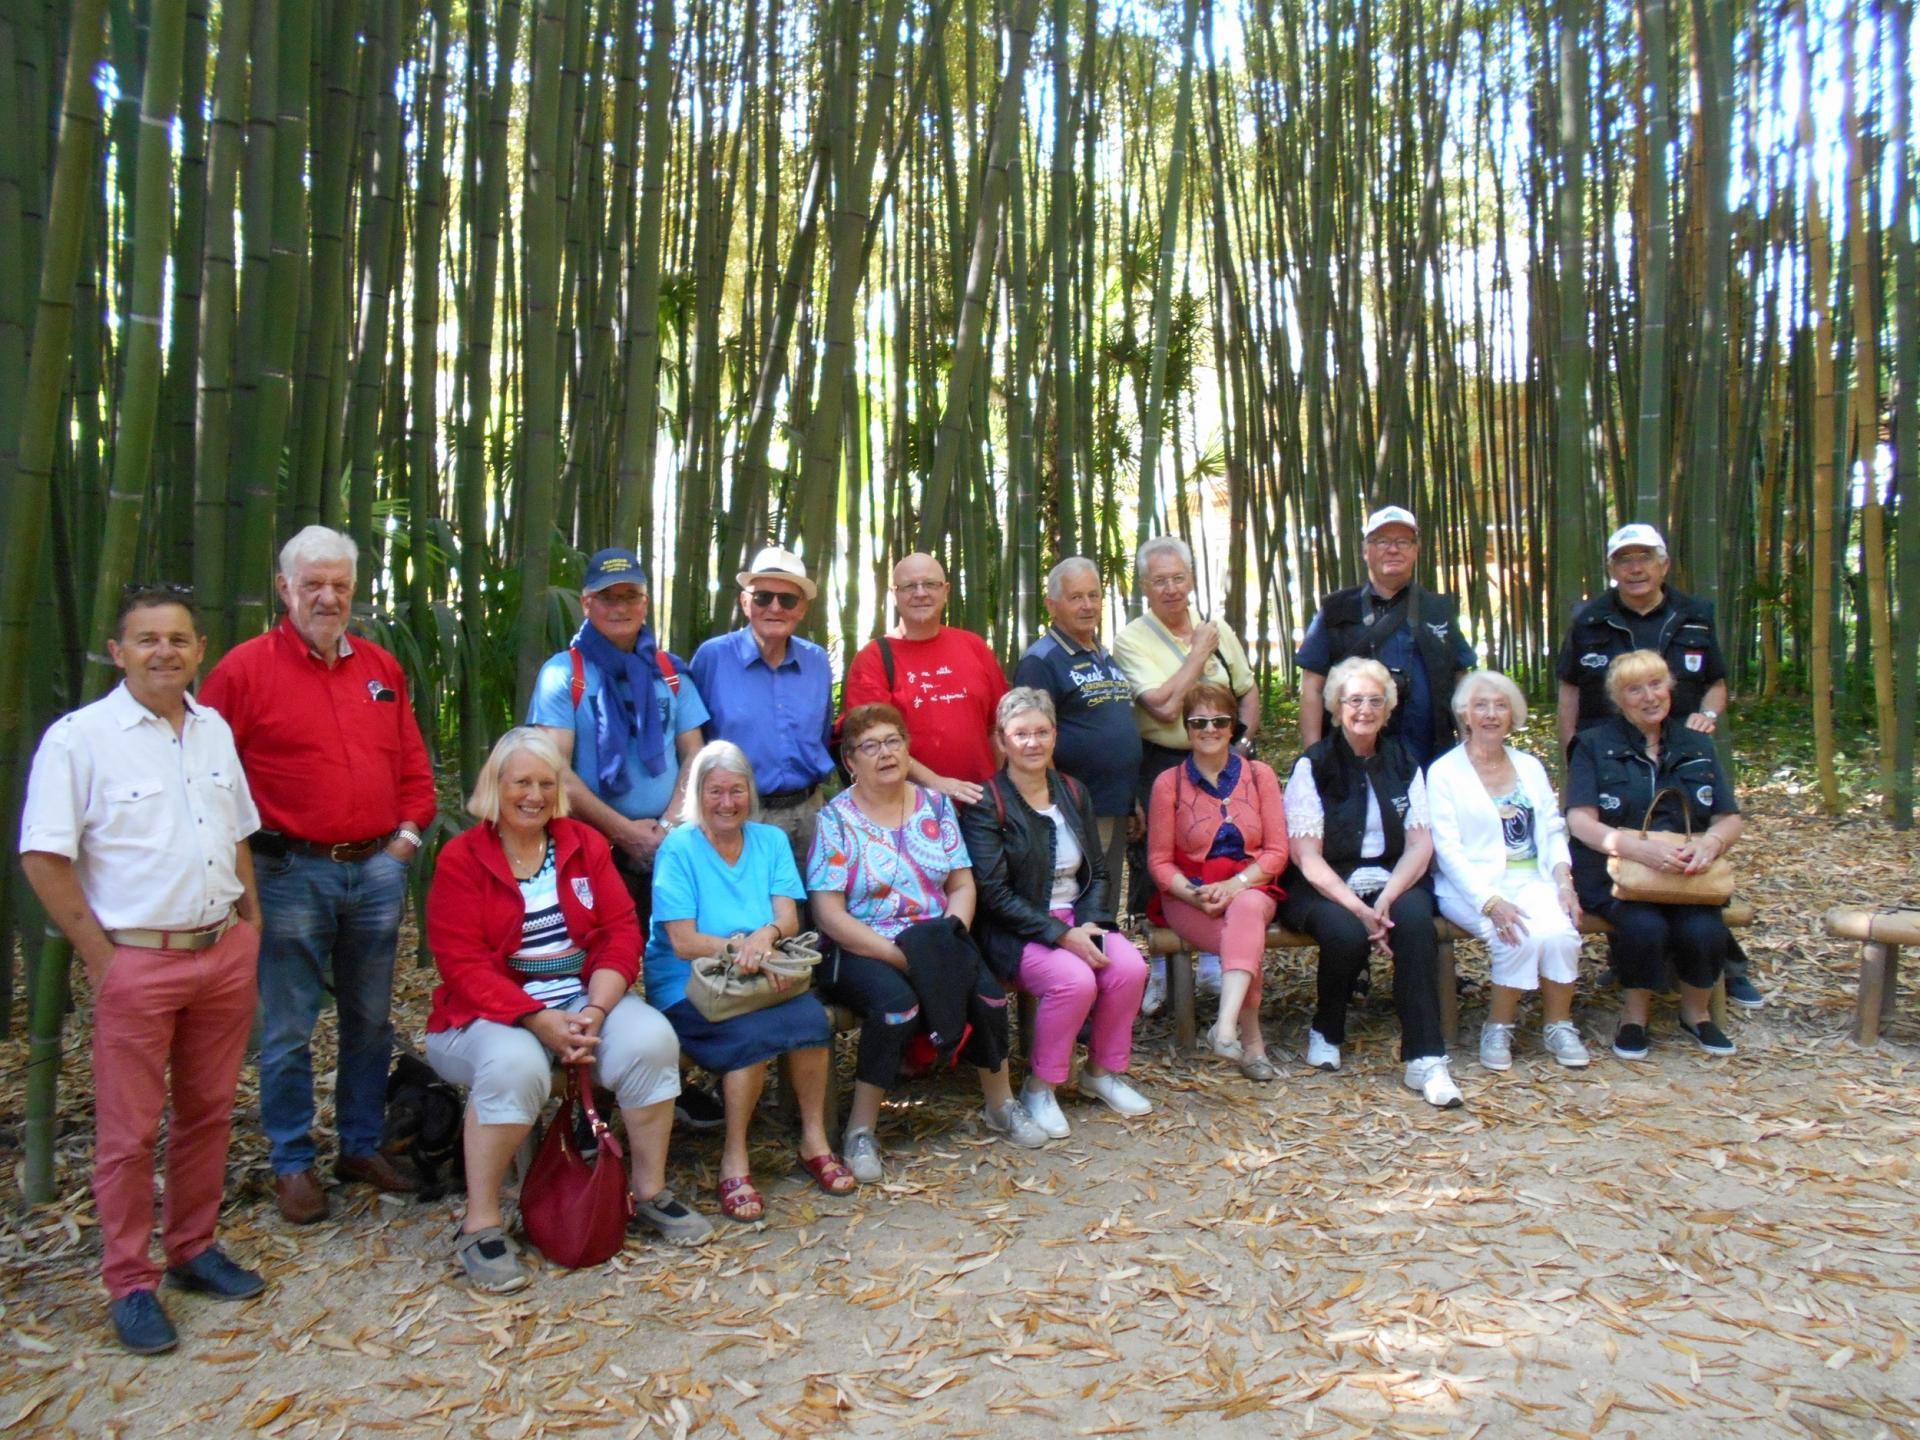 Mardi 5 juin - Anduze La bambouseraie